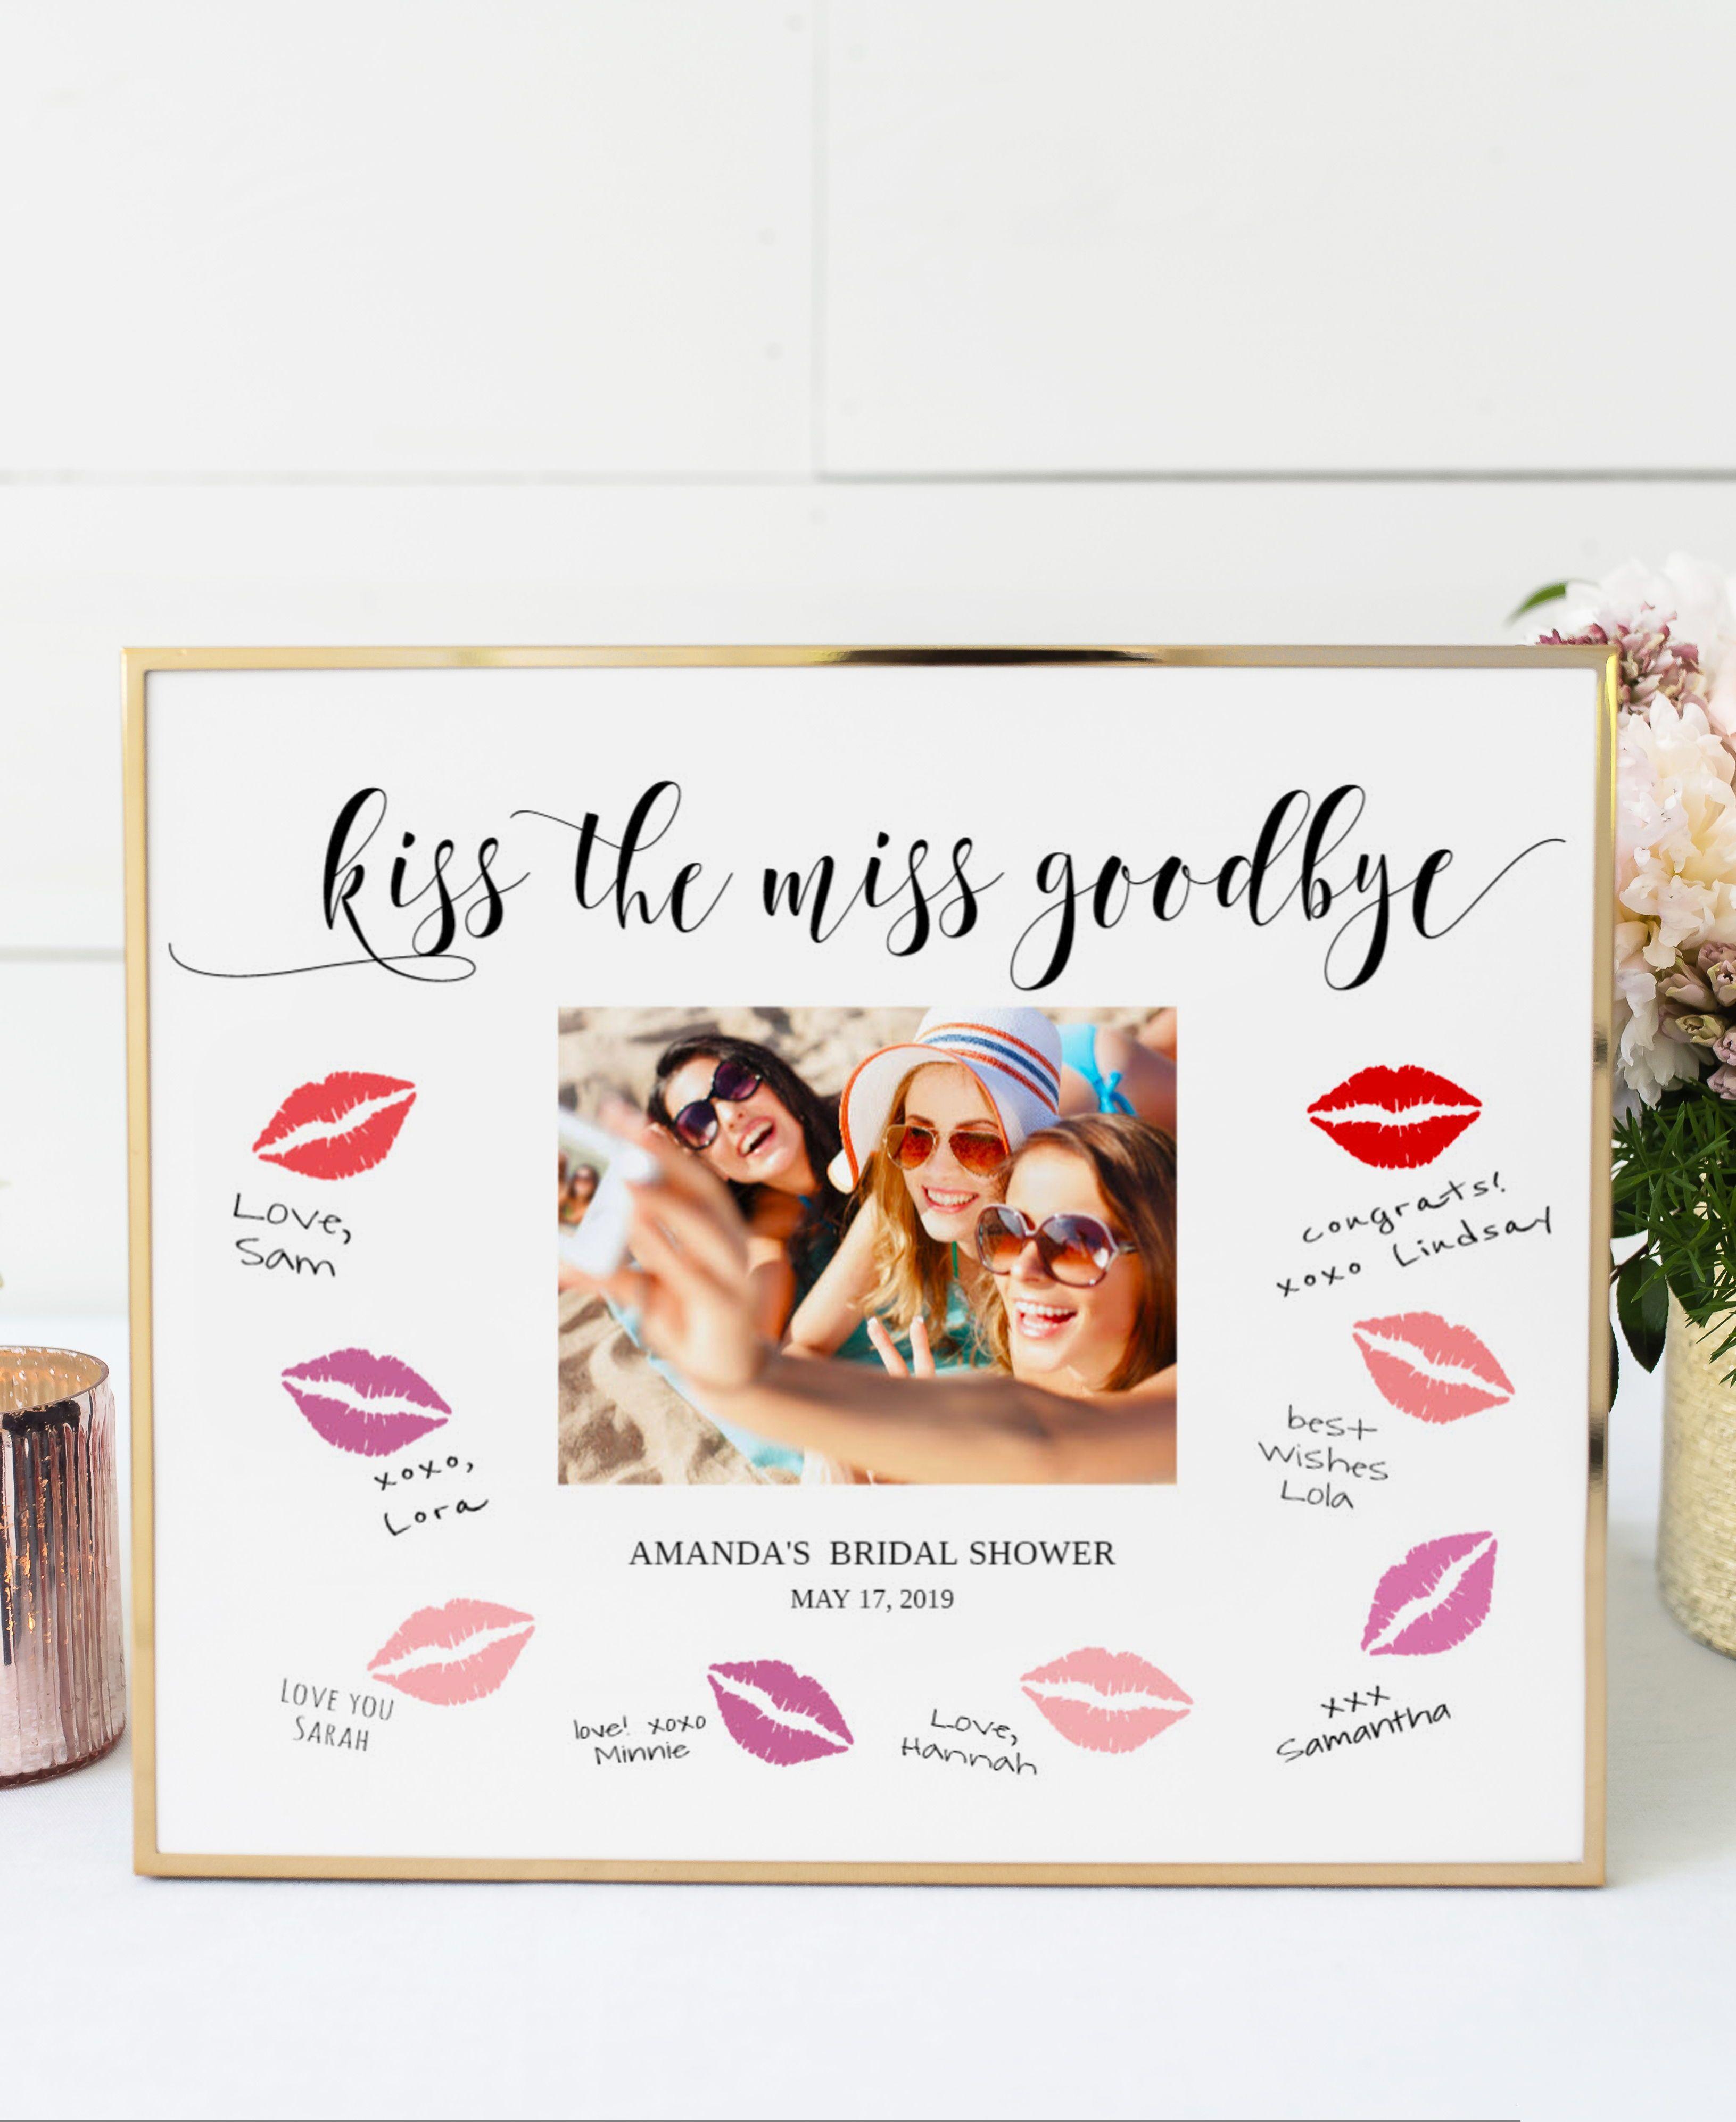 Kiss The Miss Goodbye Frame Printable Template Bridal Shower Etsy Bridal Shower Signs Bachelorette Party Bridal Shower